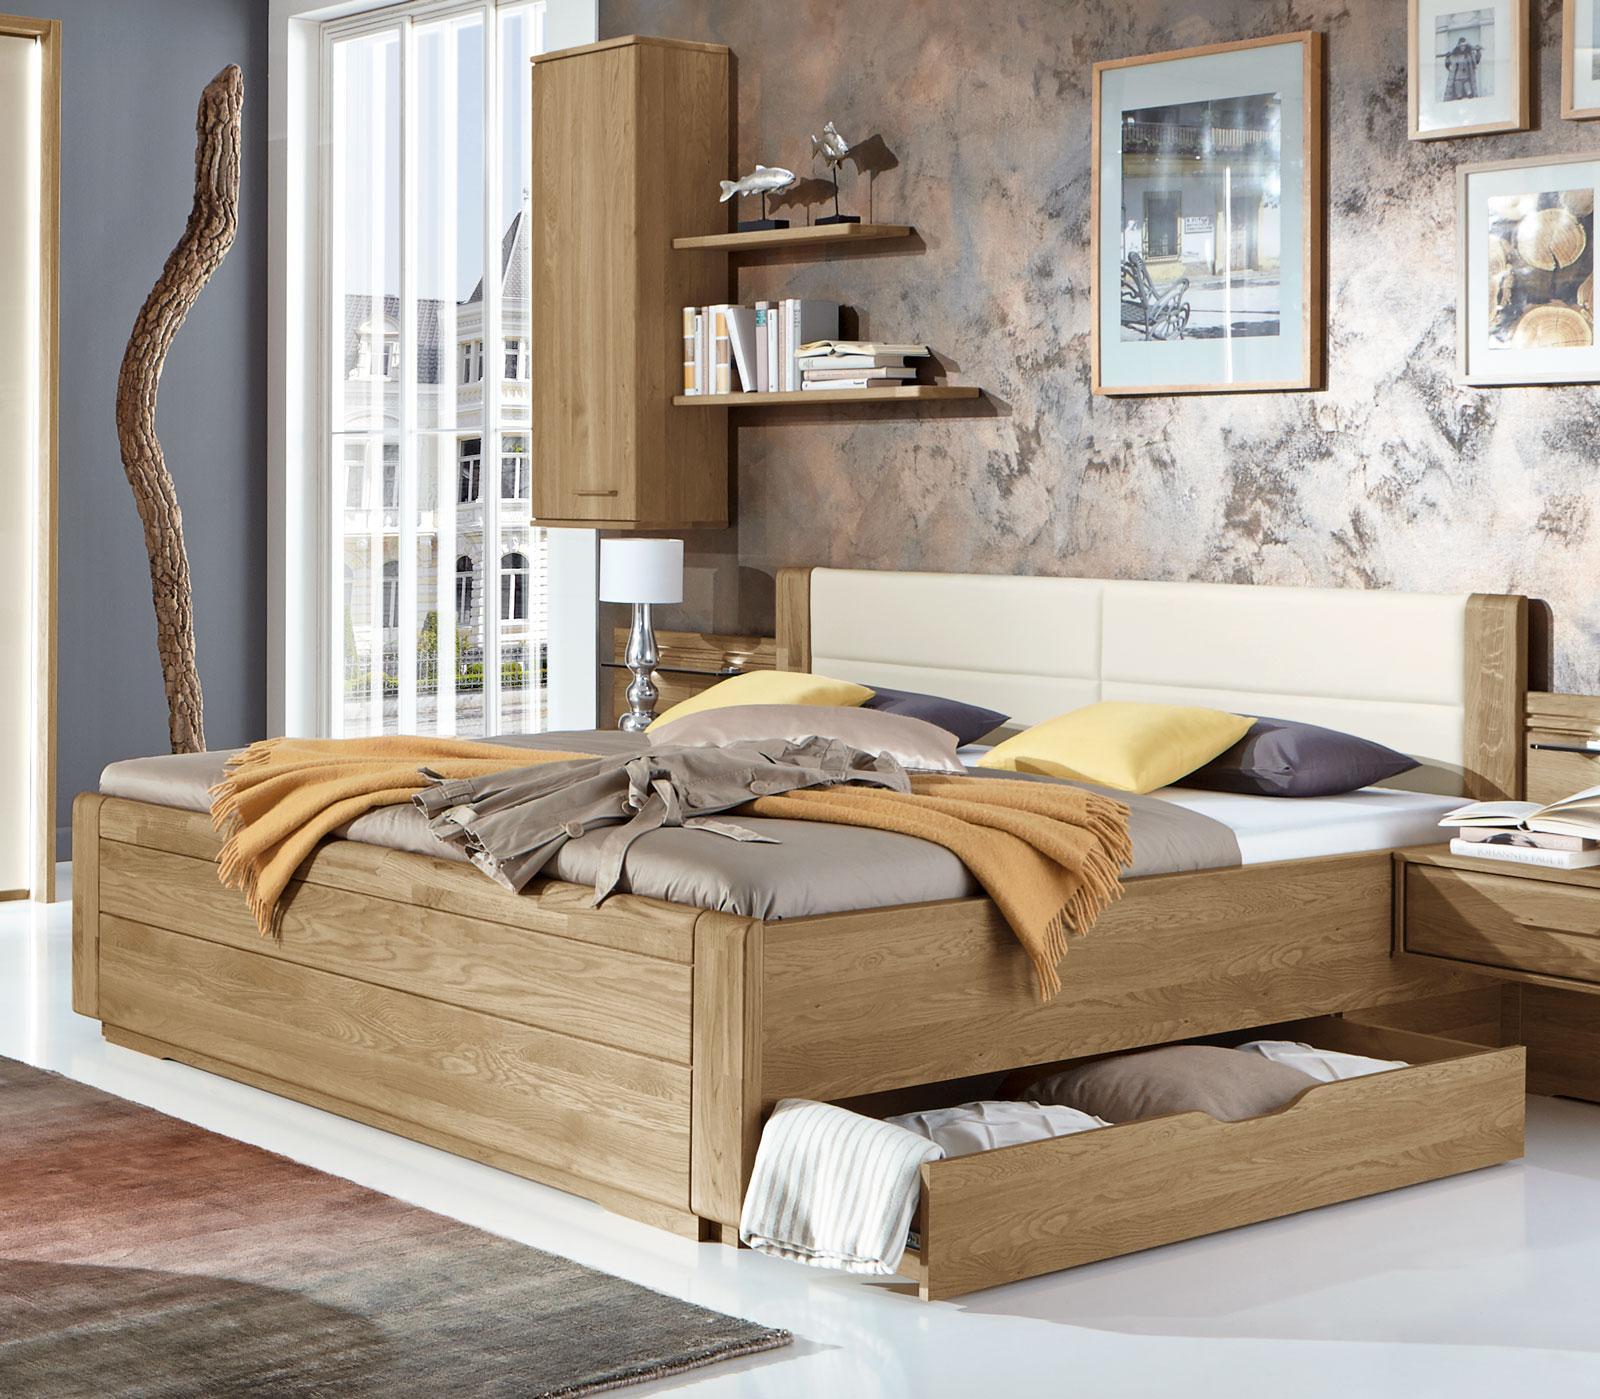 mit niedrigem kopfteil best niedriges with mit niedrigem kopfteil free bett mit niedrigem. Black Bedroom Furniture Sets. Home Design Ideas